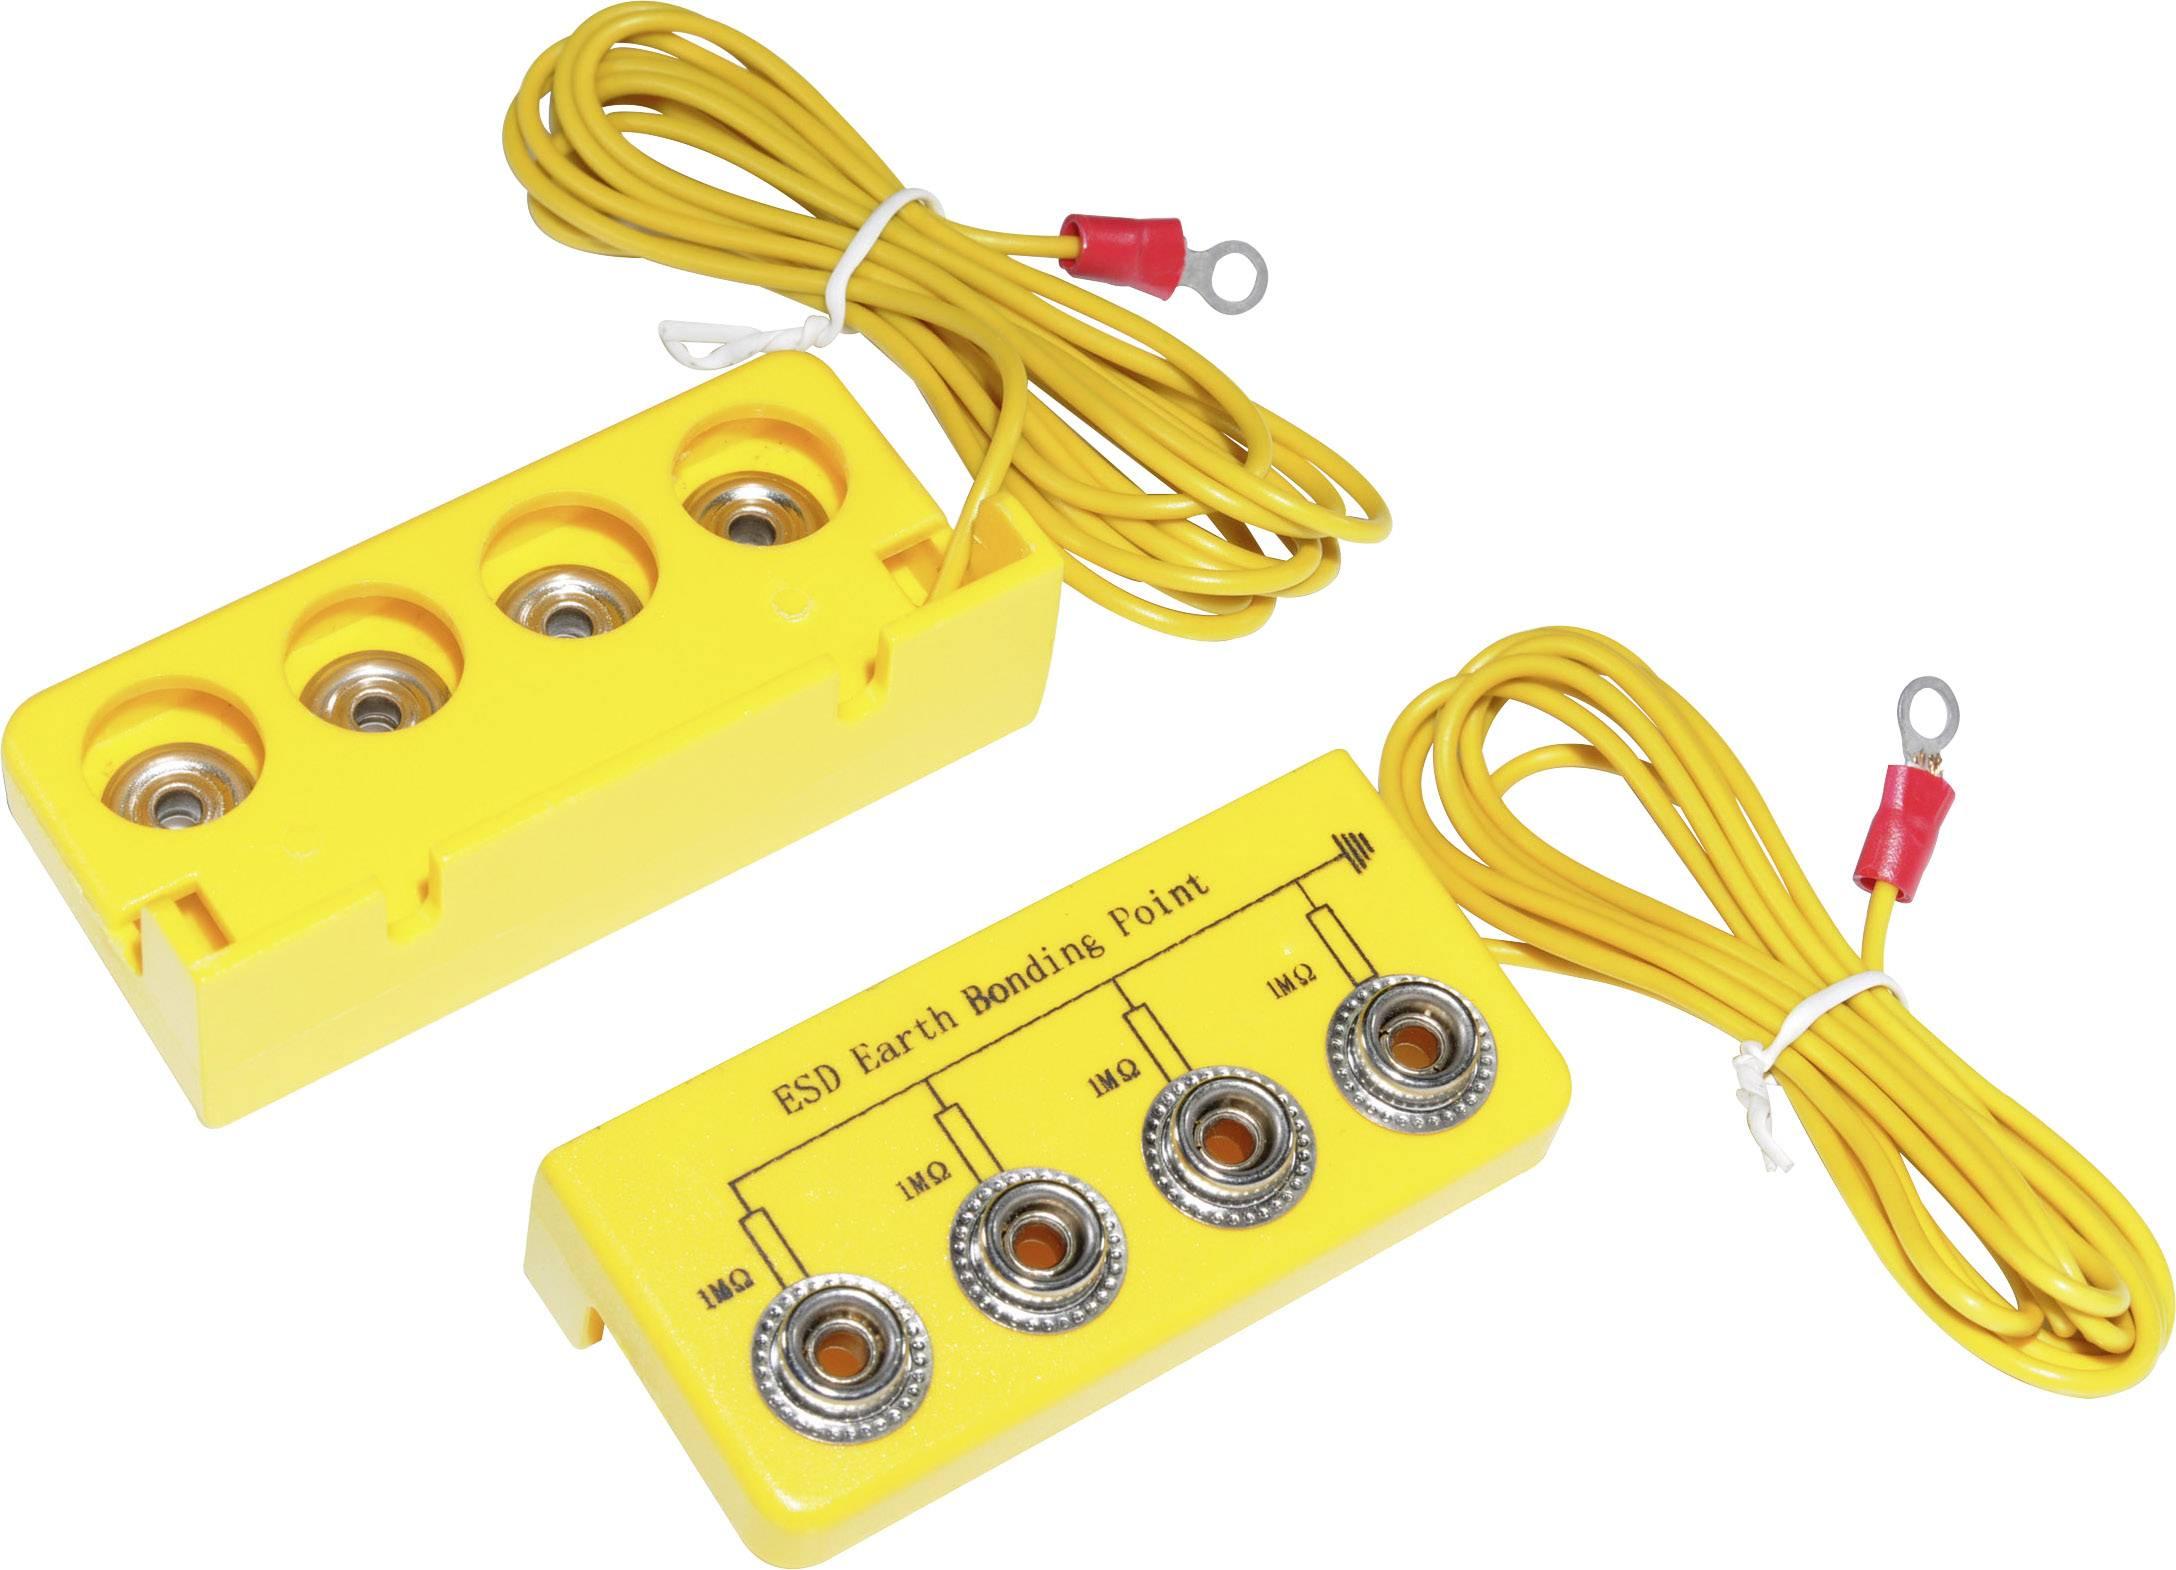 ESD uzemňovací box Conrad Components EBO-SETL-10-305-R, 3.05 m